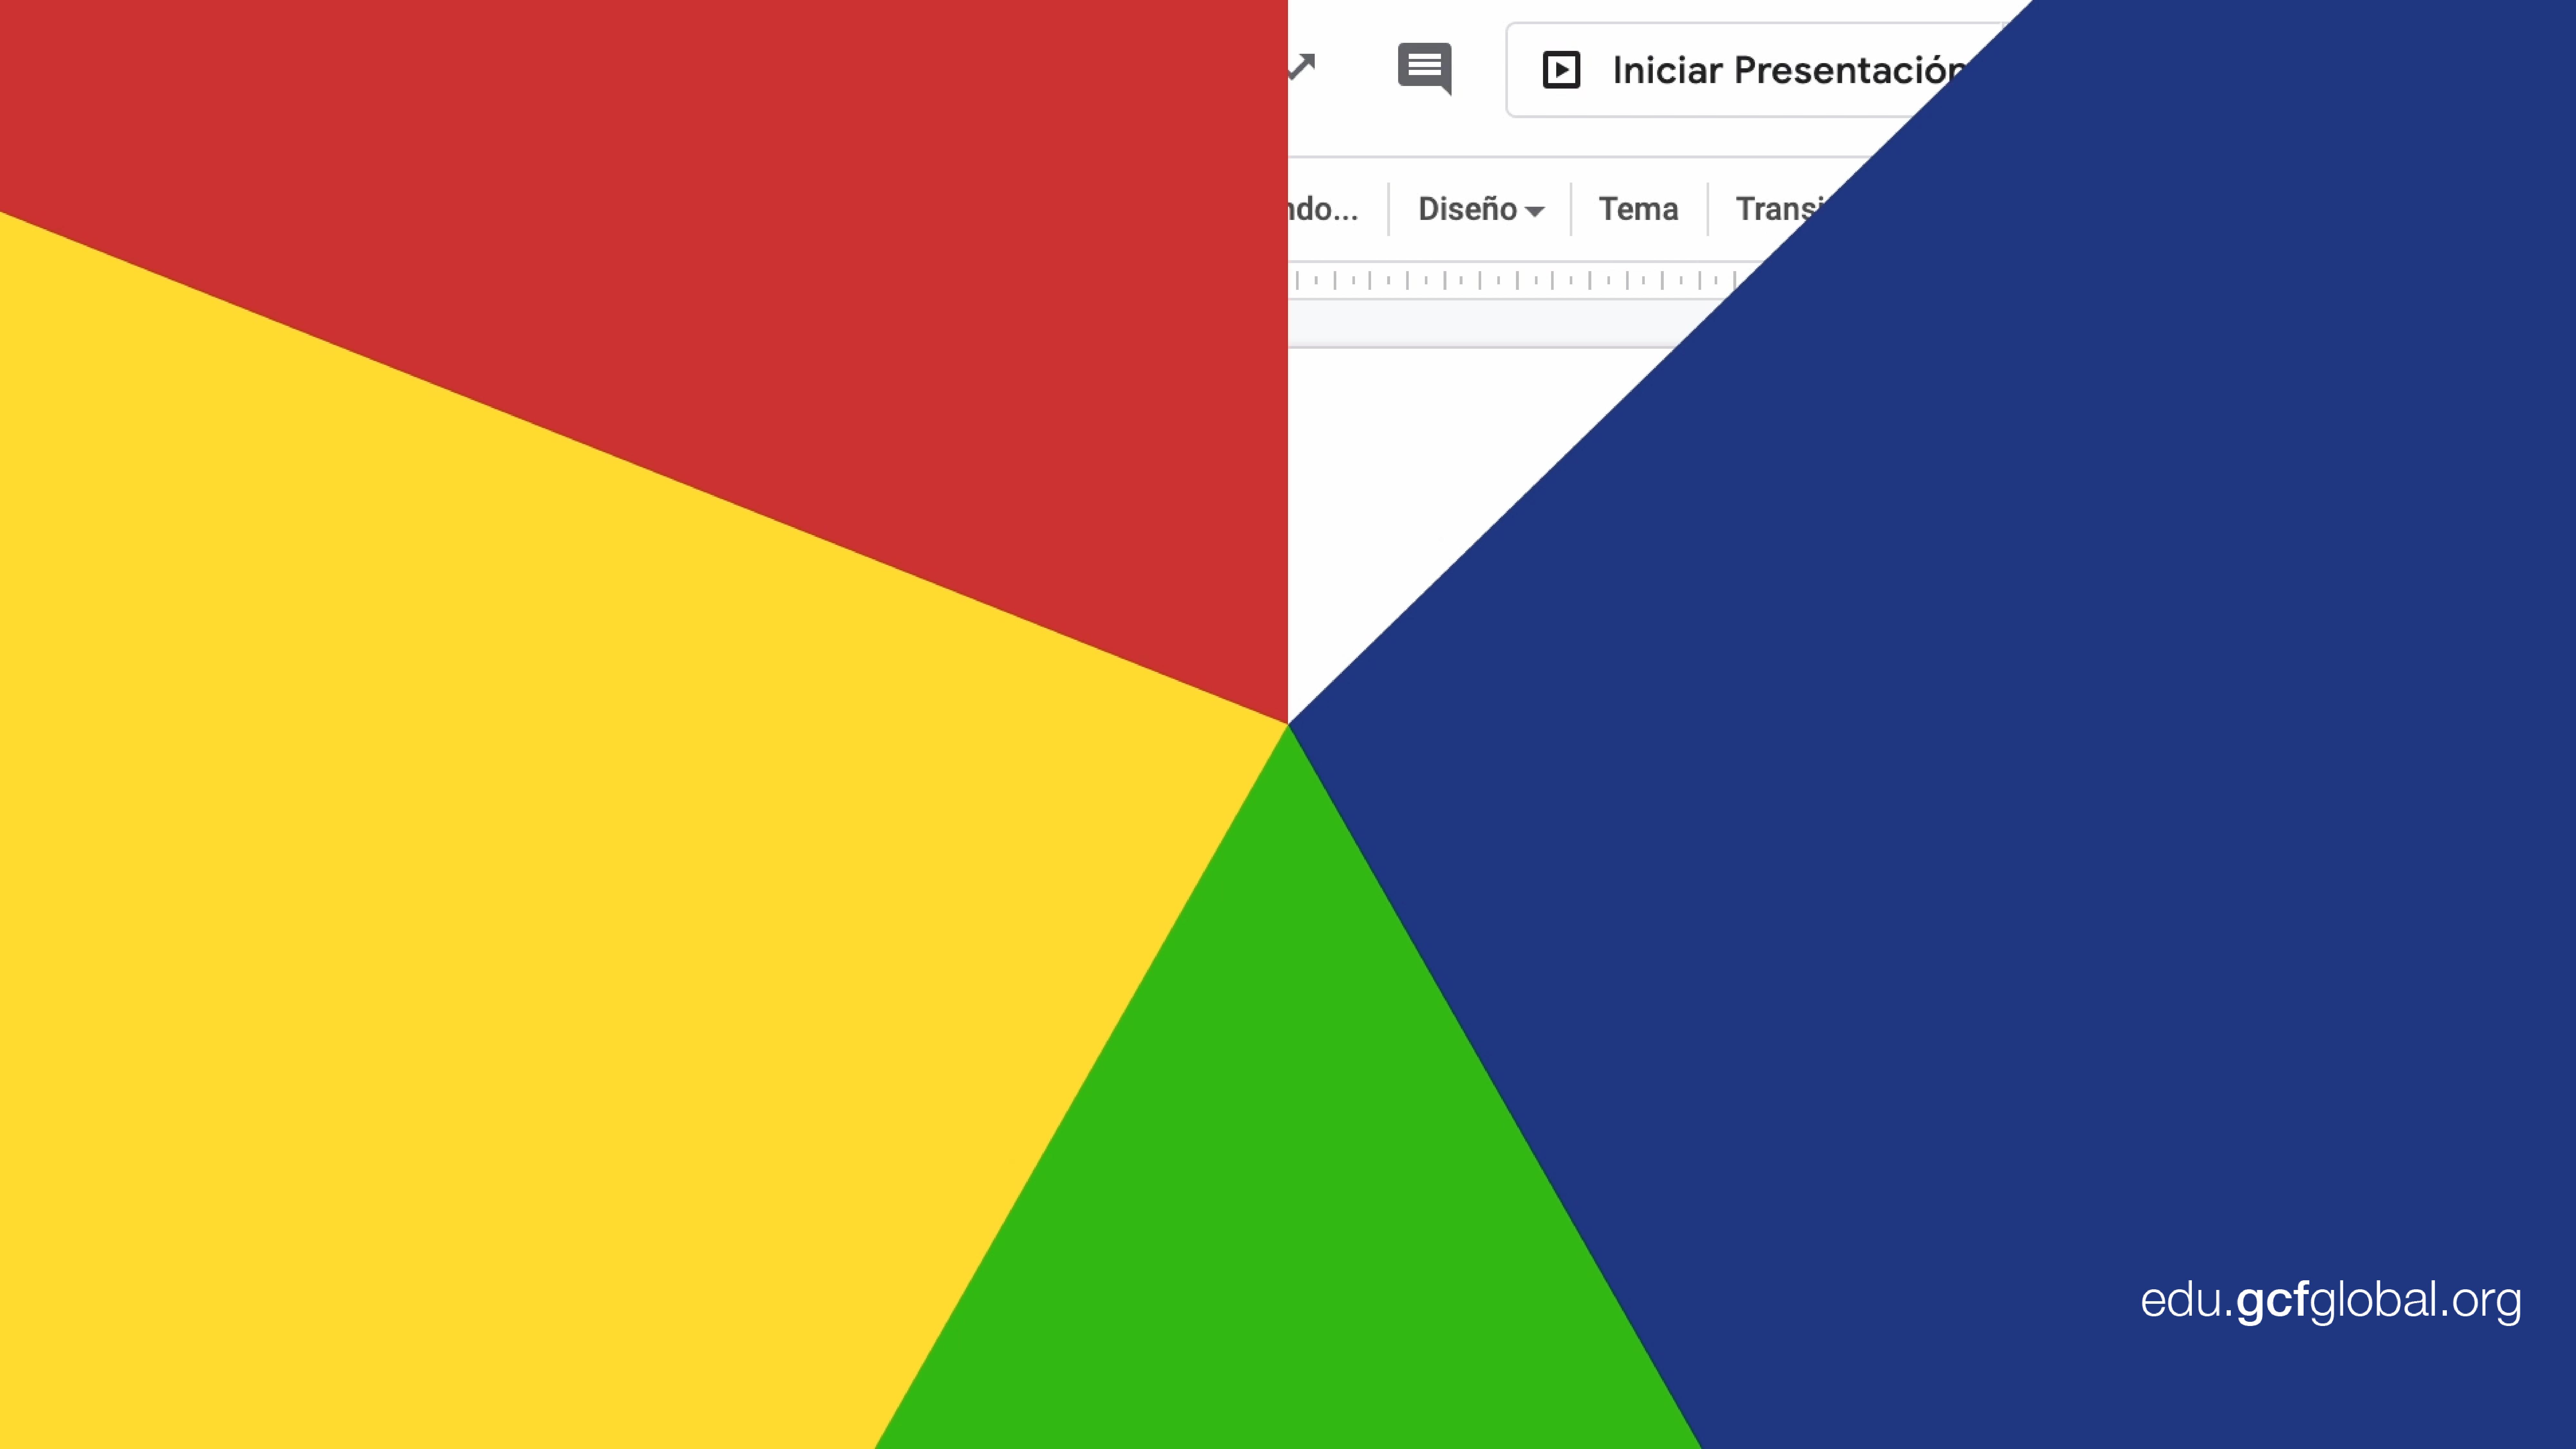 Imagen de diapositiva con varias capas de color.